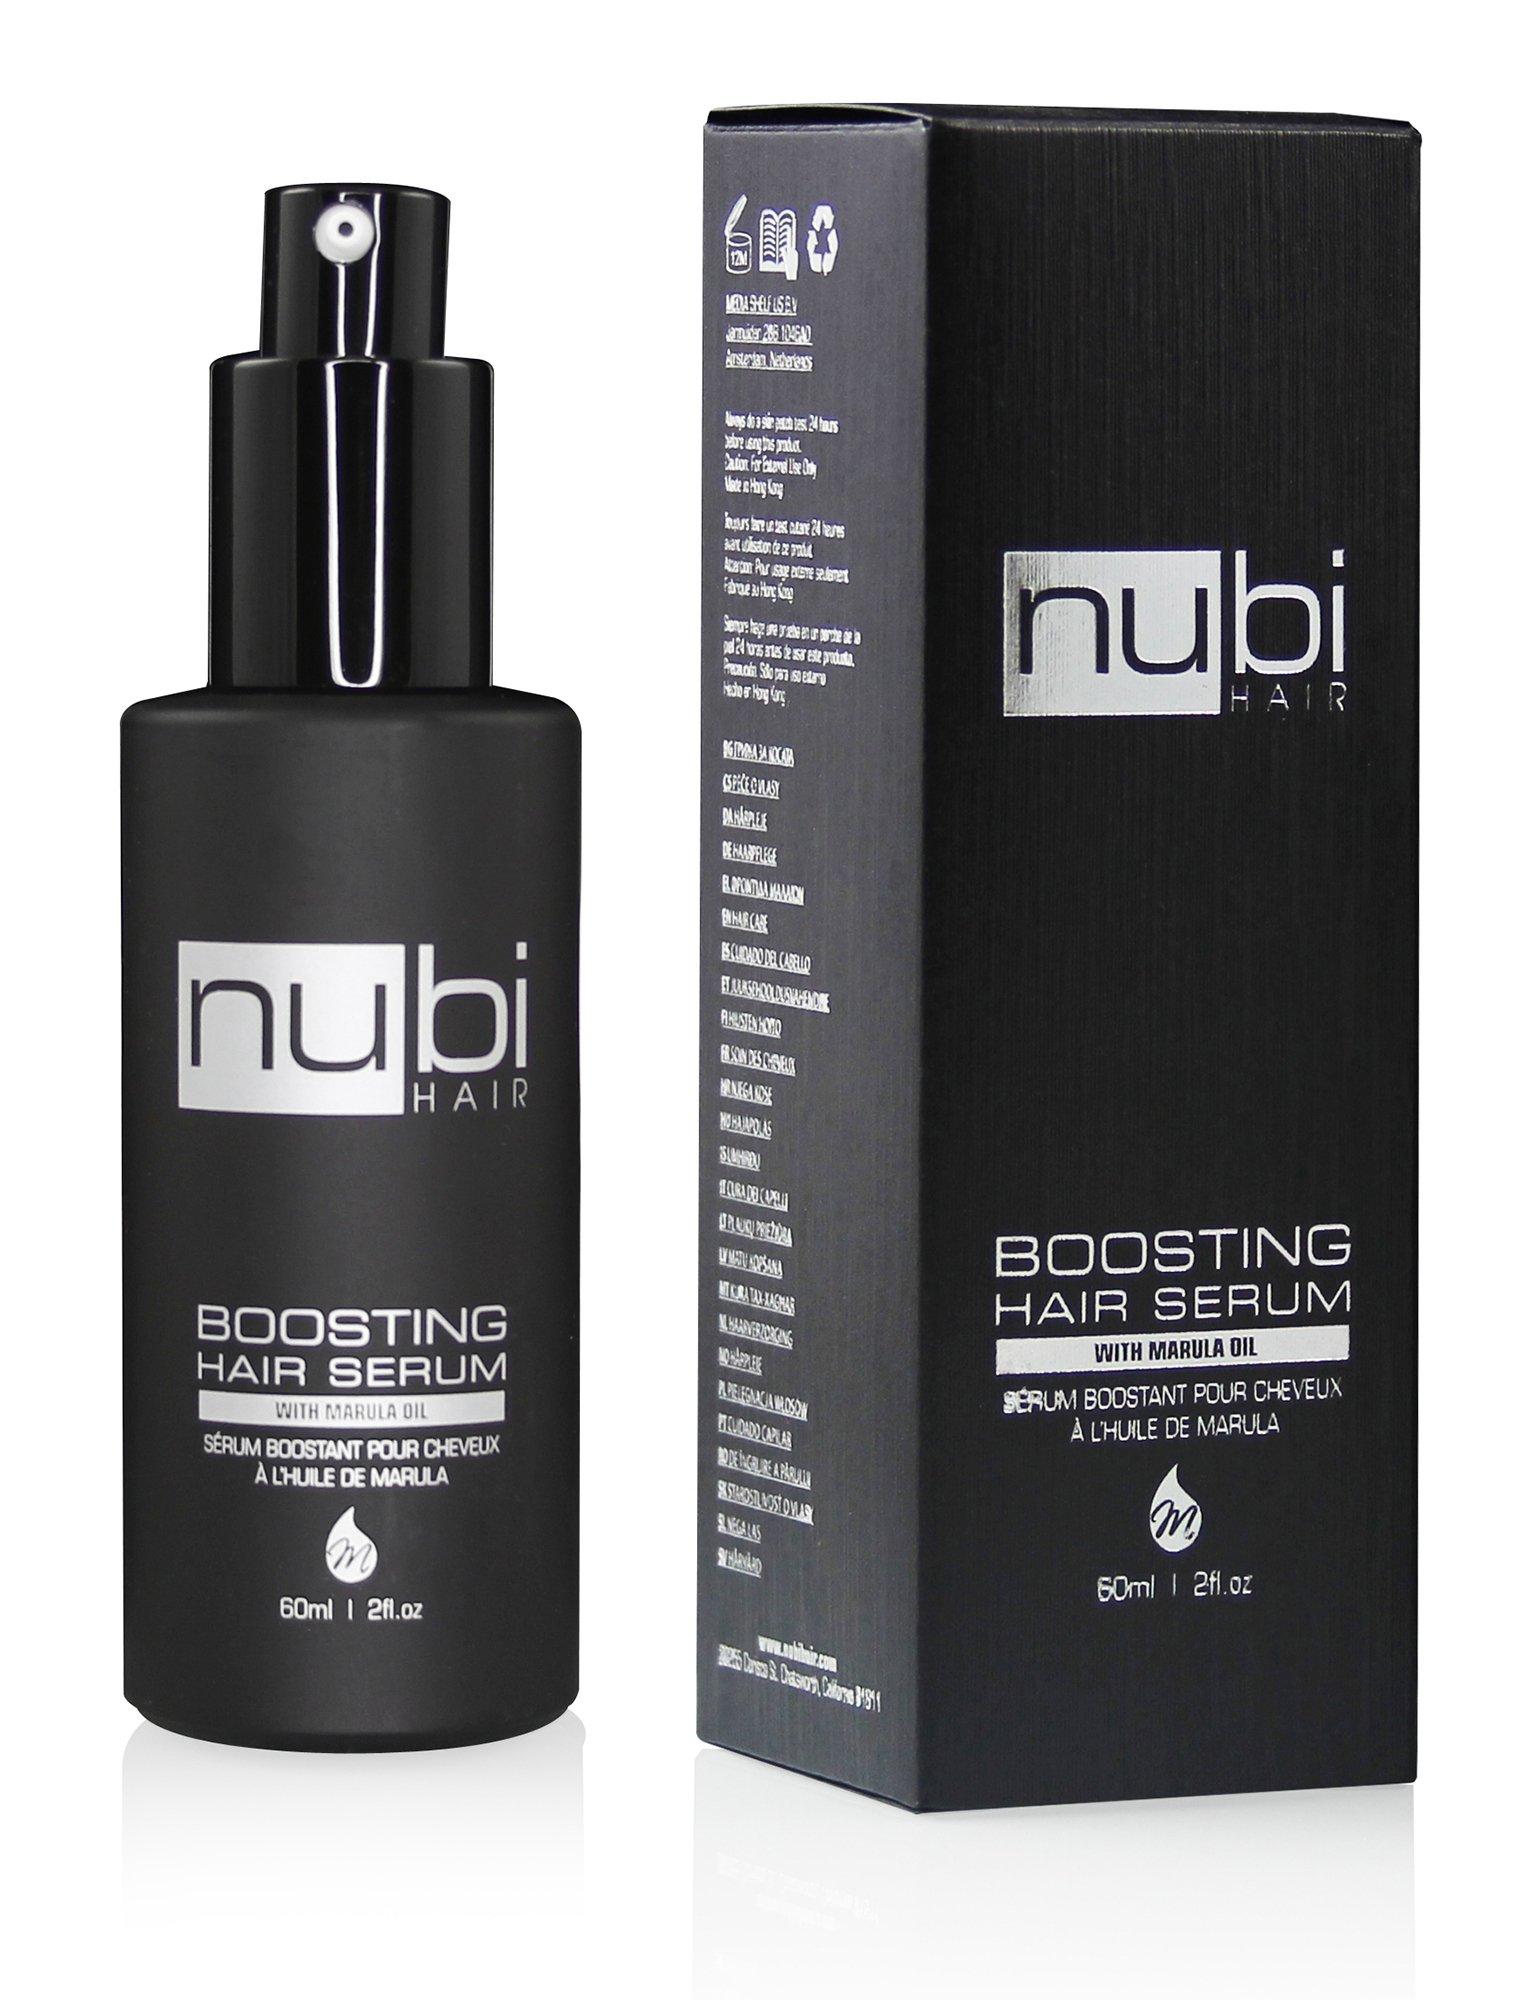 Nubi Boosting Hair Marula Vitamin